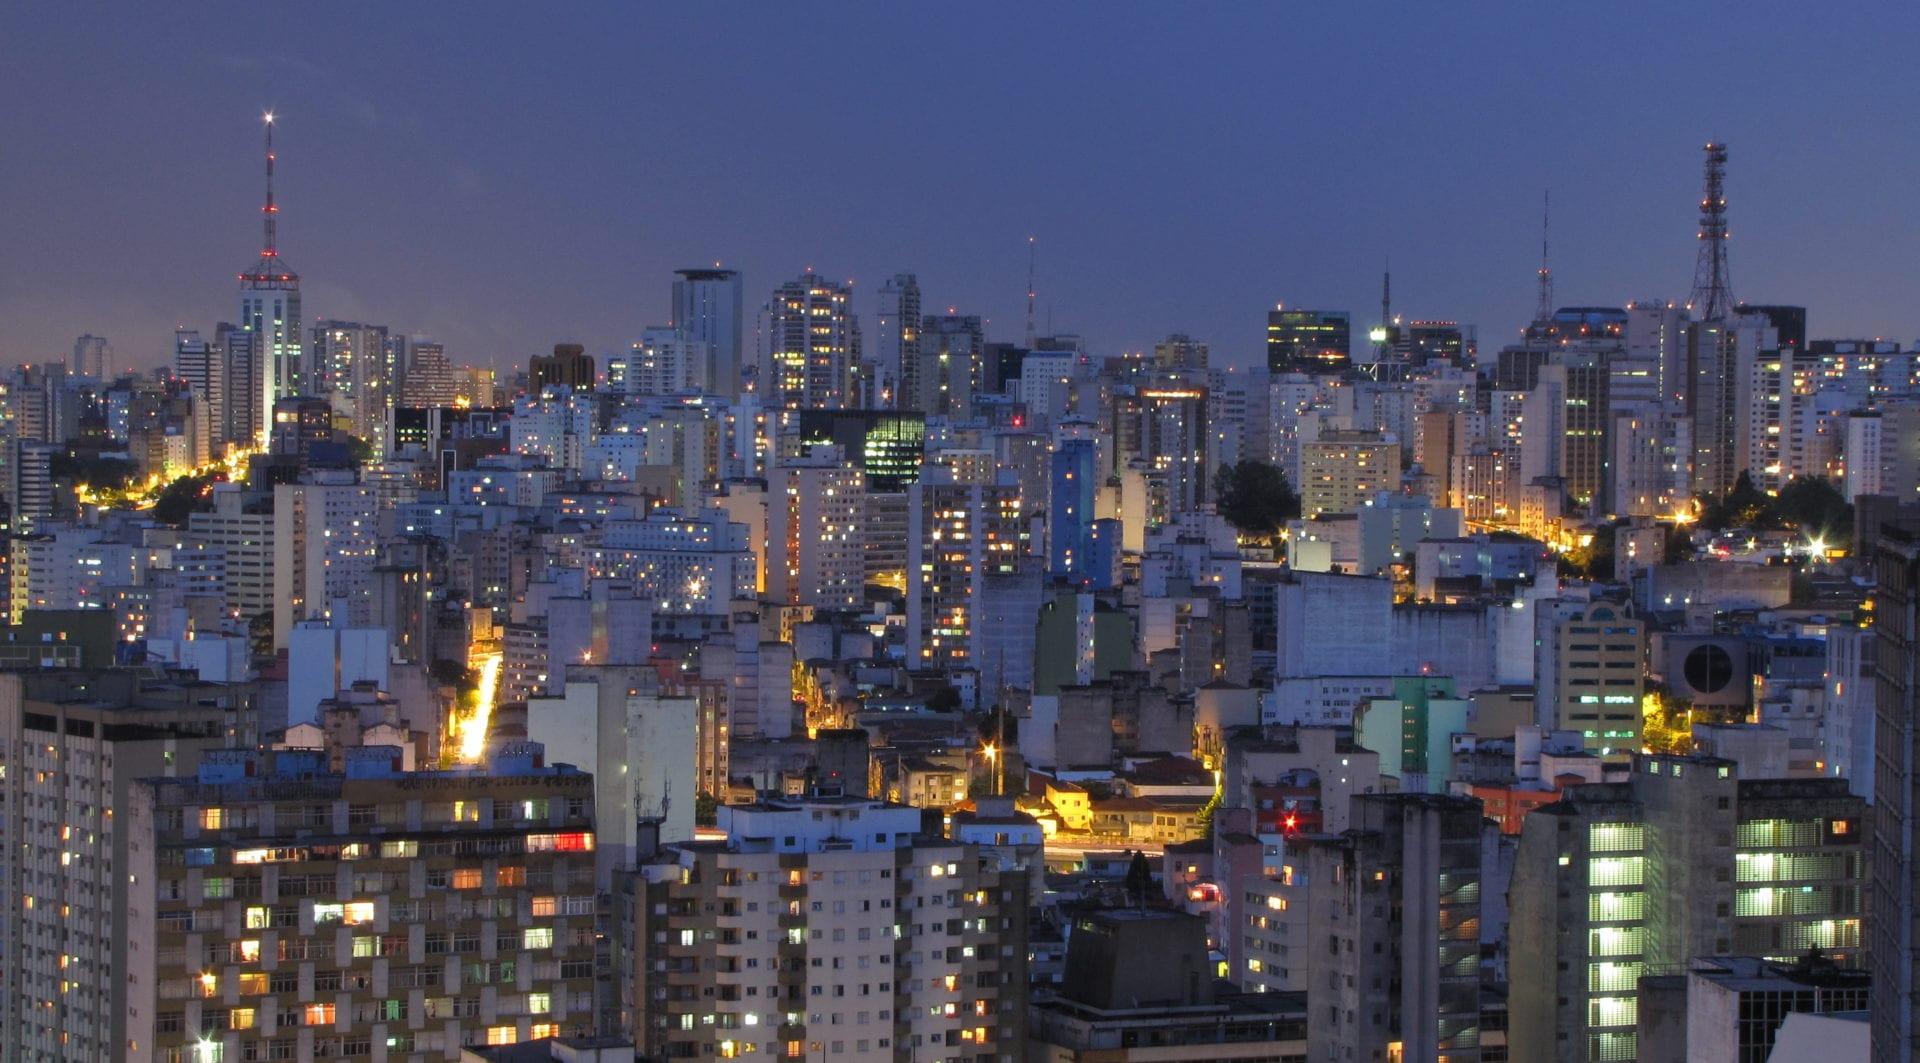 SÃO PAULO AT THE BRAZILIAN GRAND PRIX